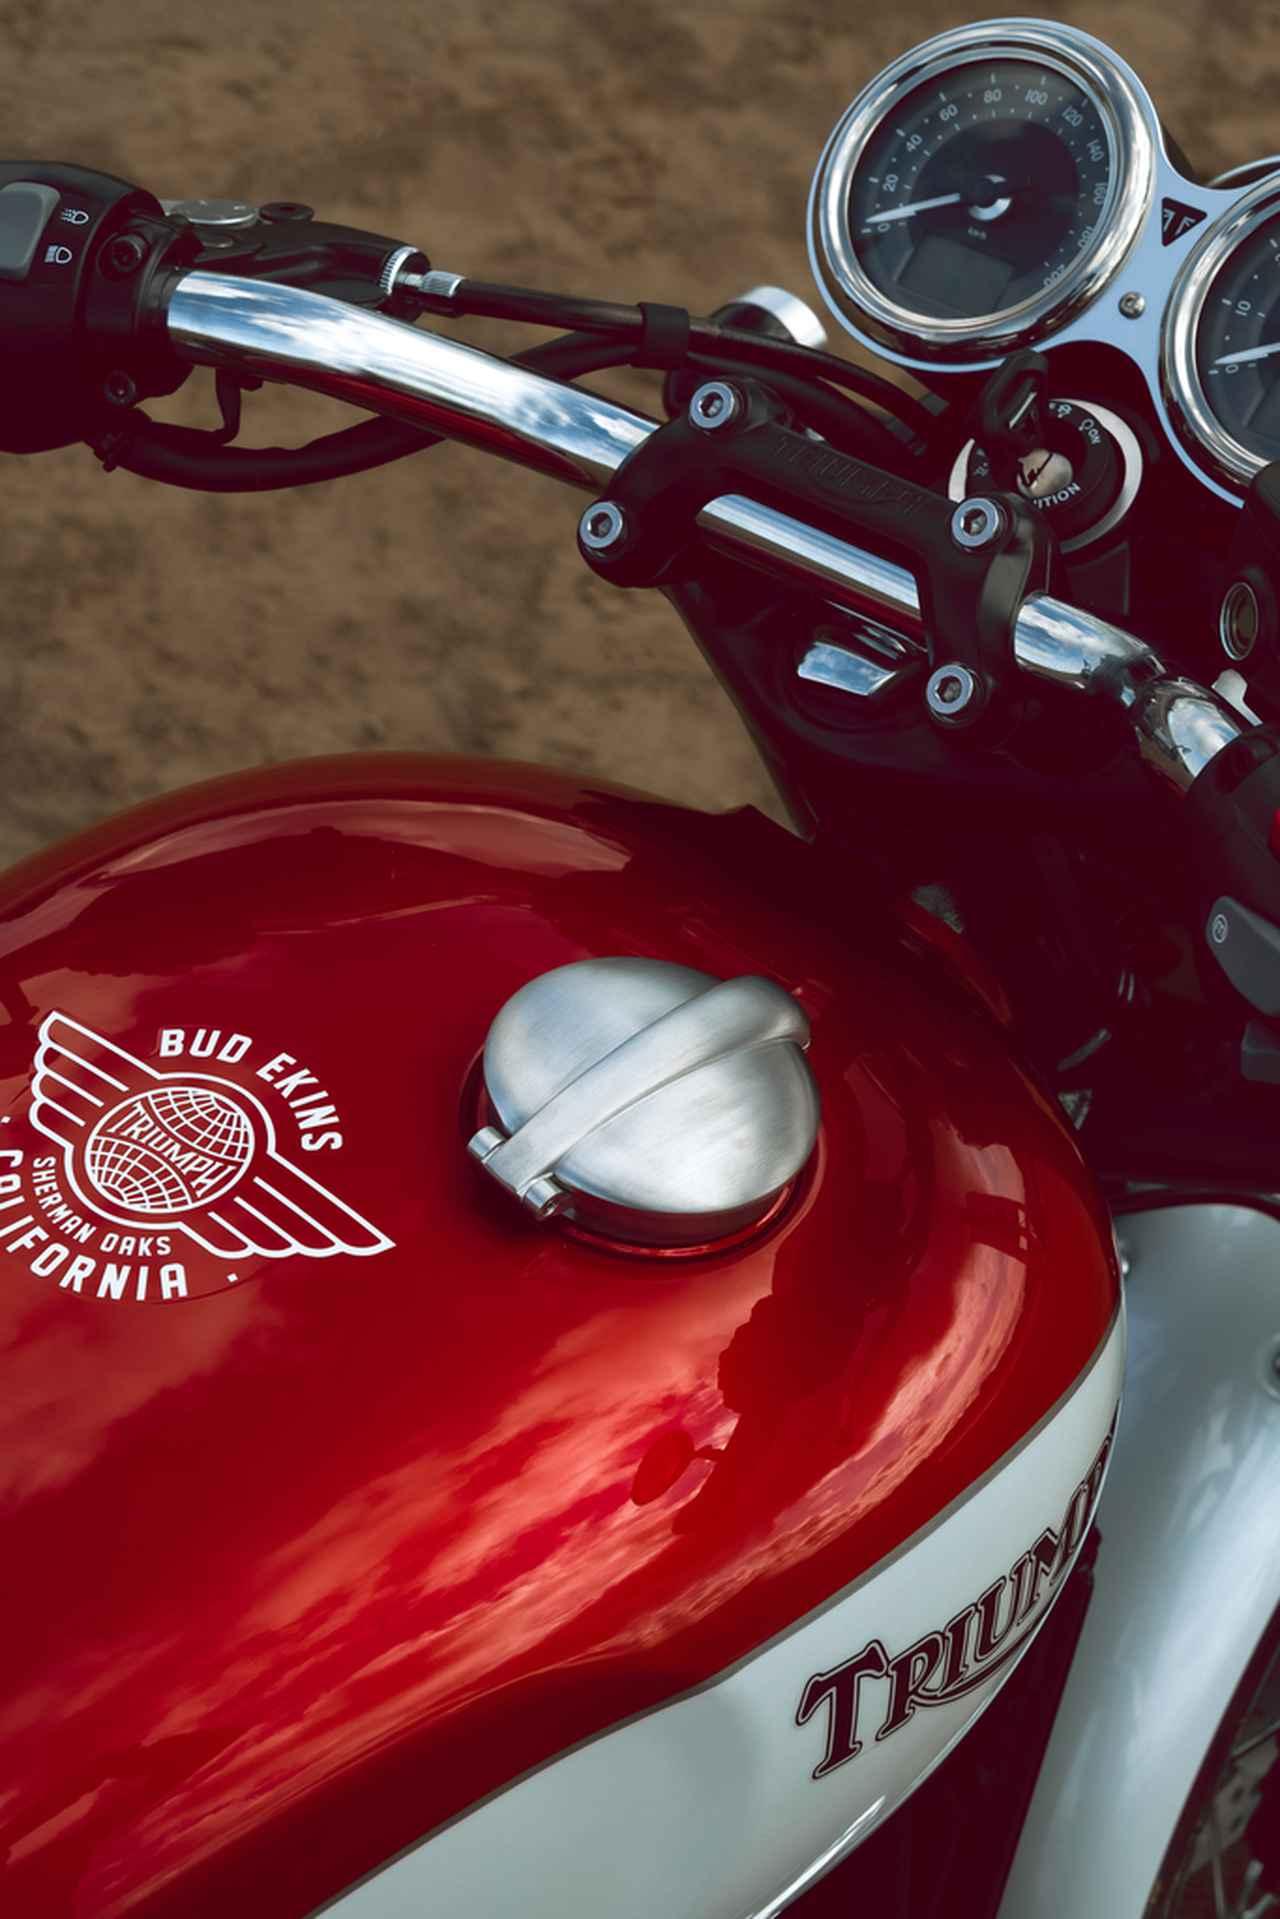 Images : 7番目の画像 - 「Bud Ekins Bonneville T120」の写真をもっと見る! - webオートバイ